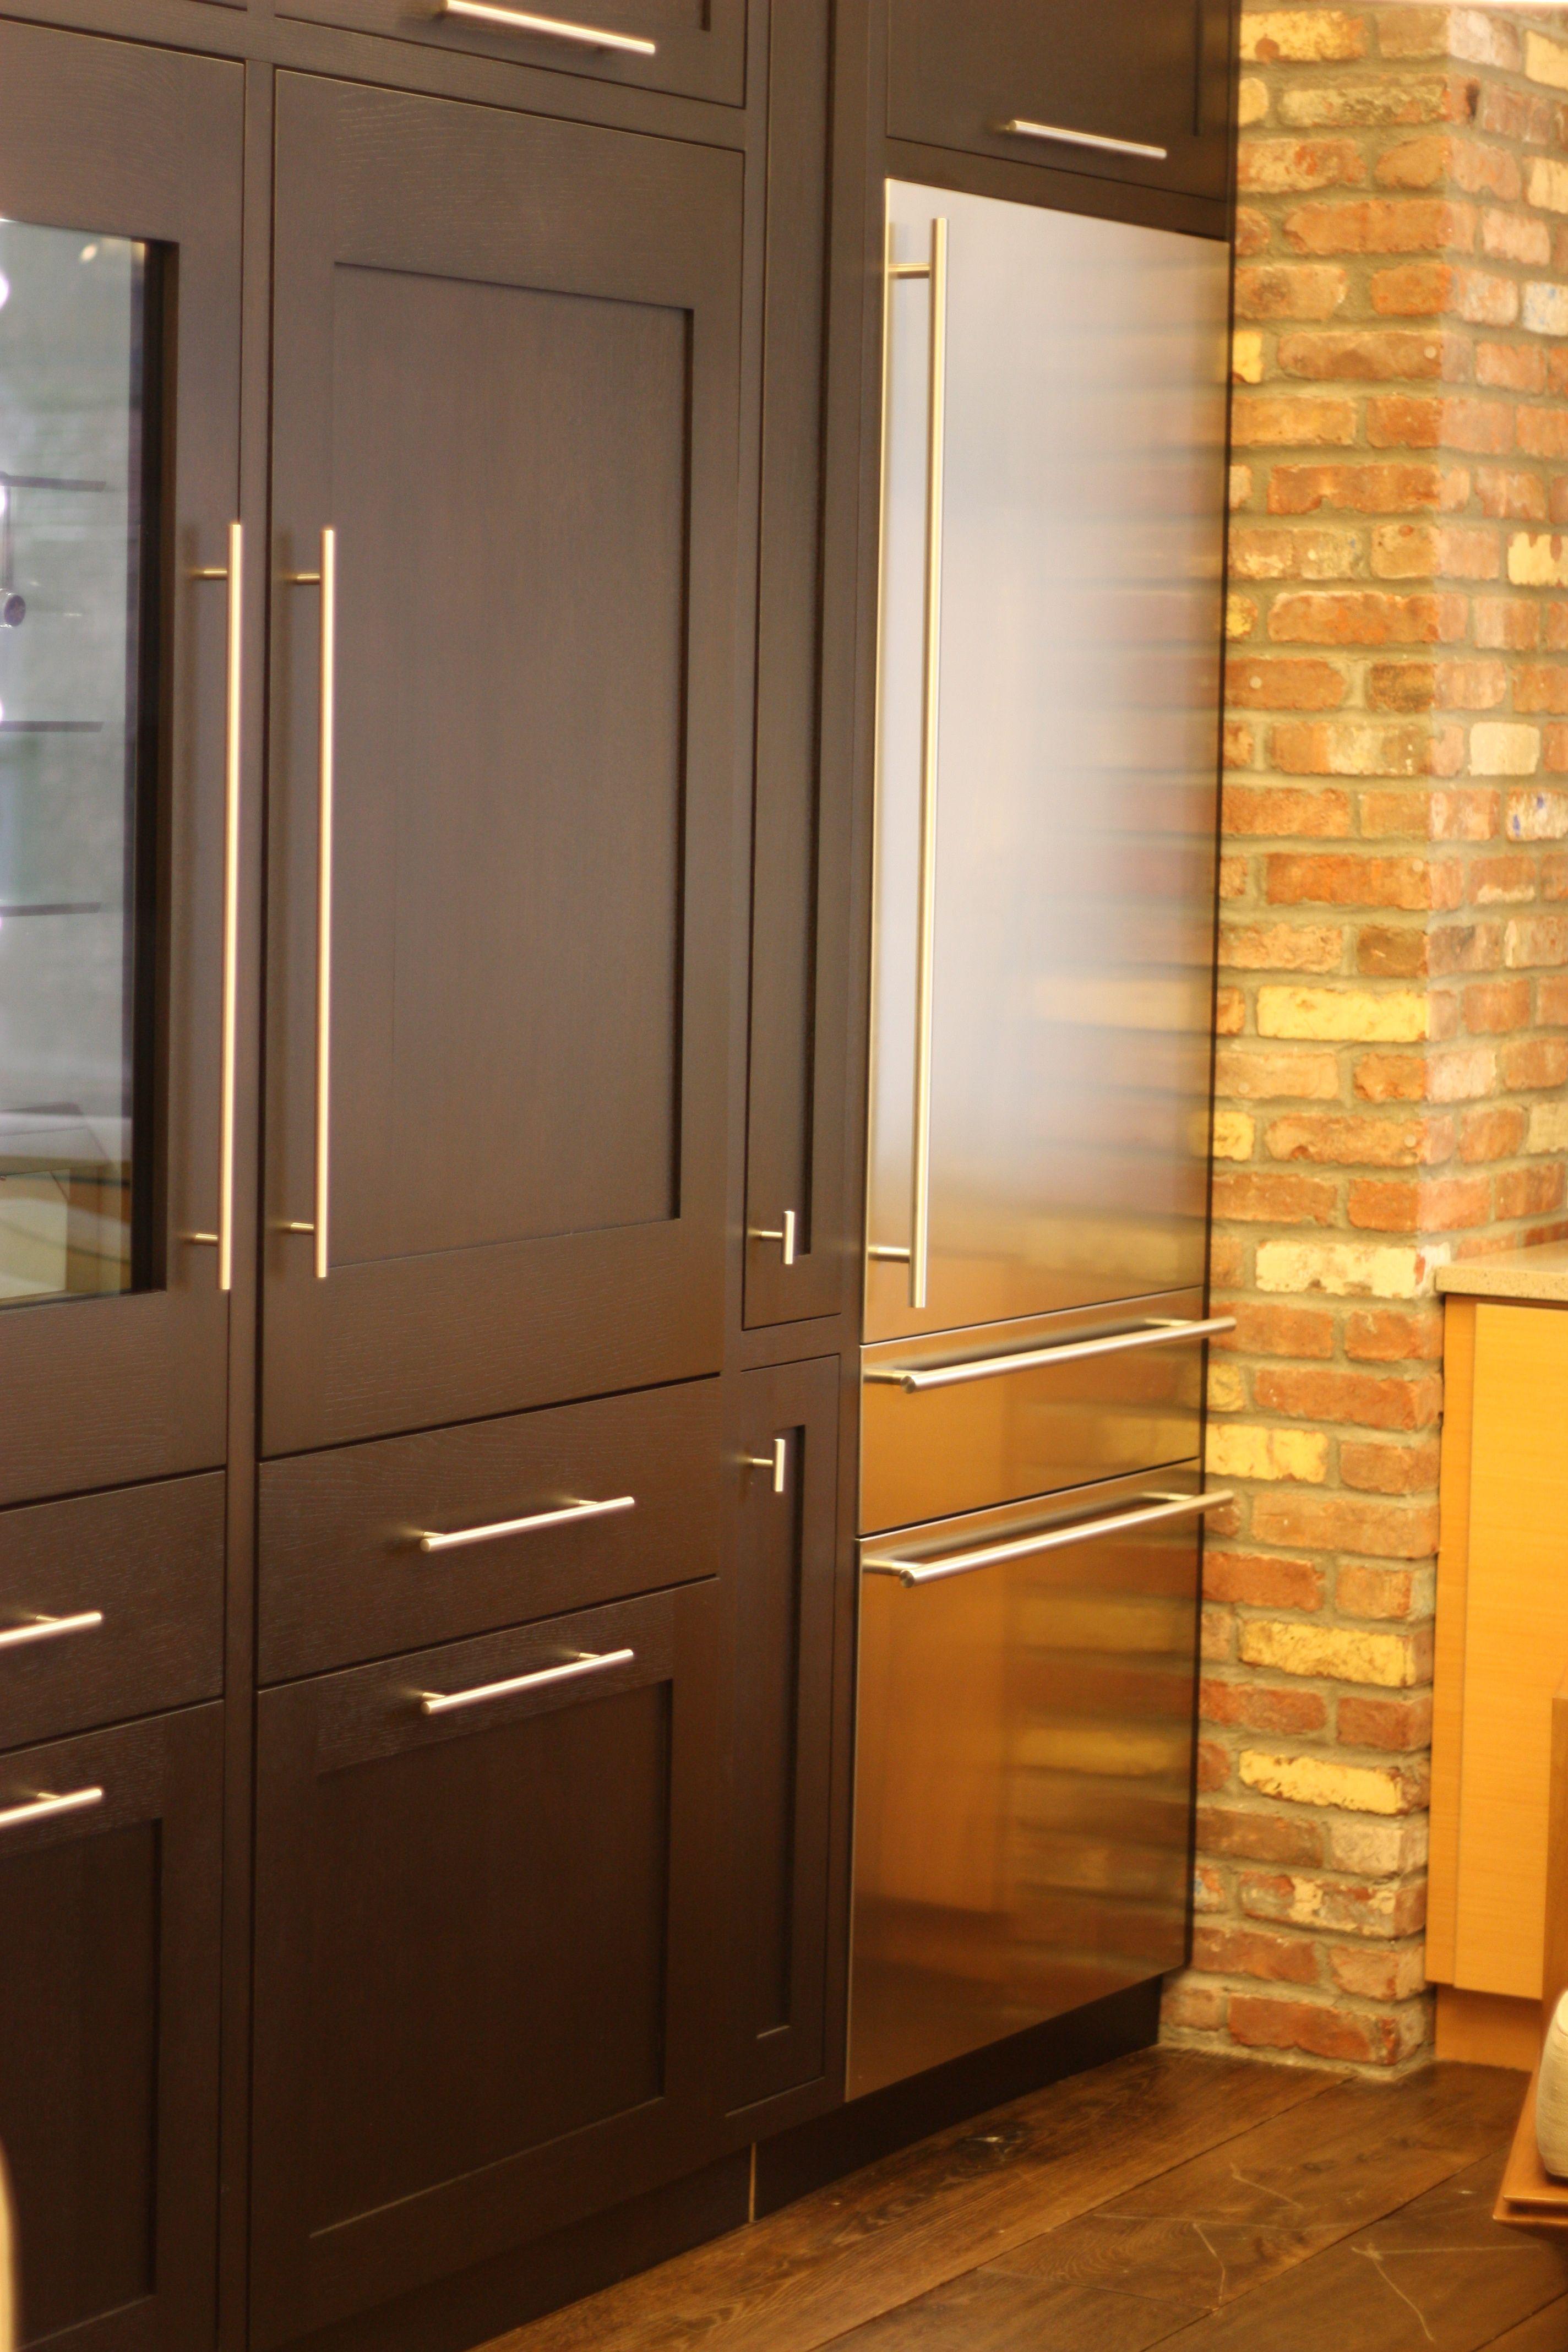 Ge Monogram 30 Built In Refrigerator Kelly S Finds The Kitchen Designer